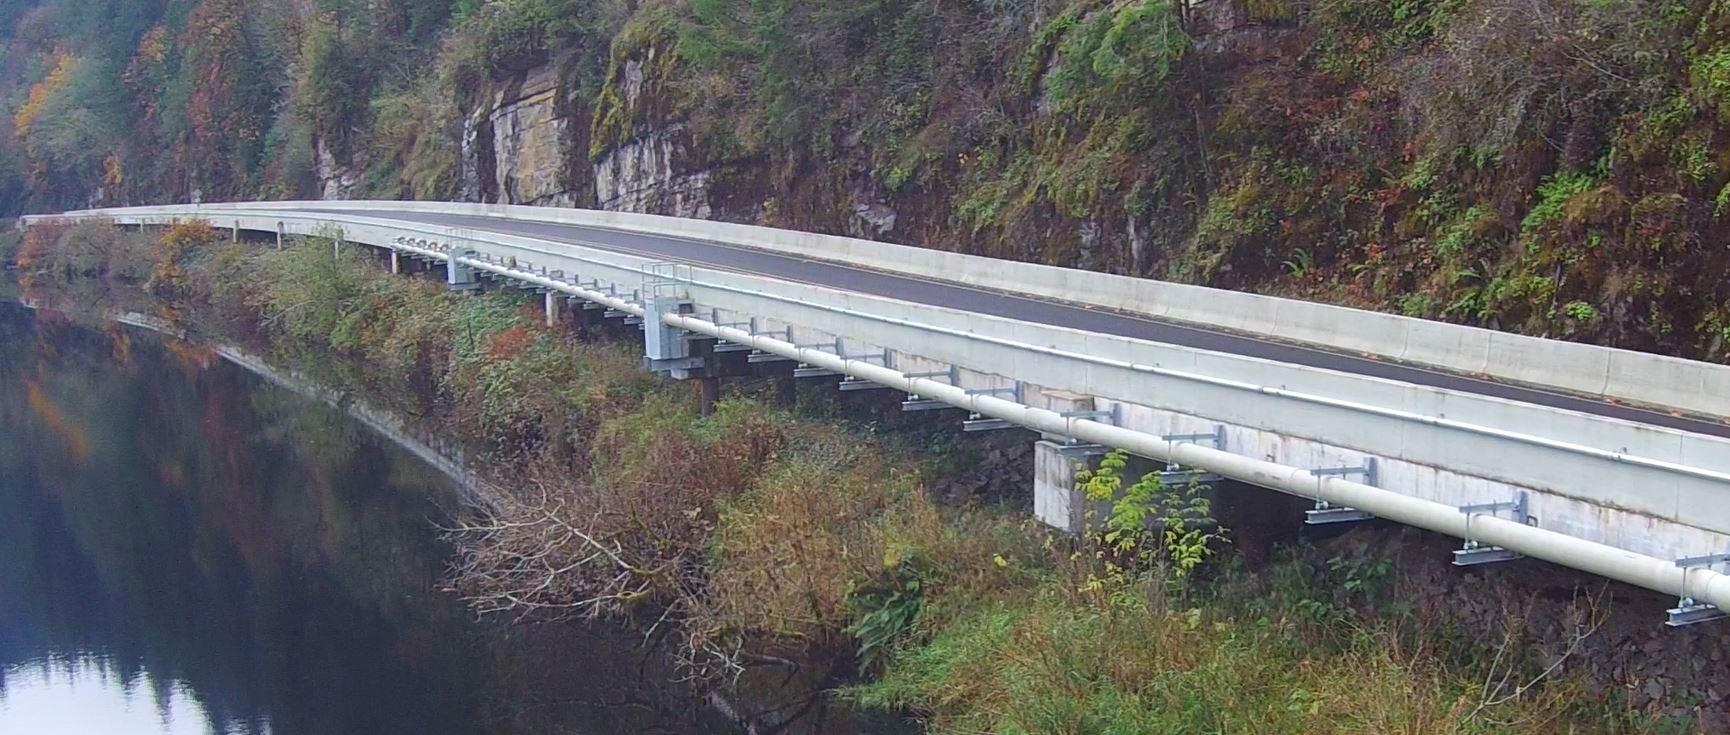 Sweet Creek Retaining Wall Replacement | Lane County, Oregon